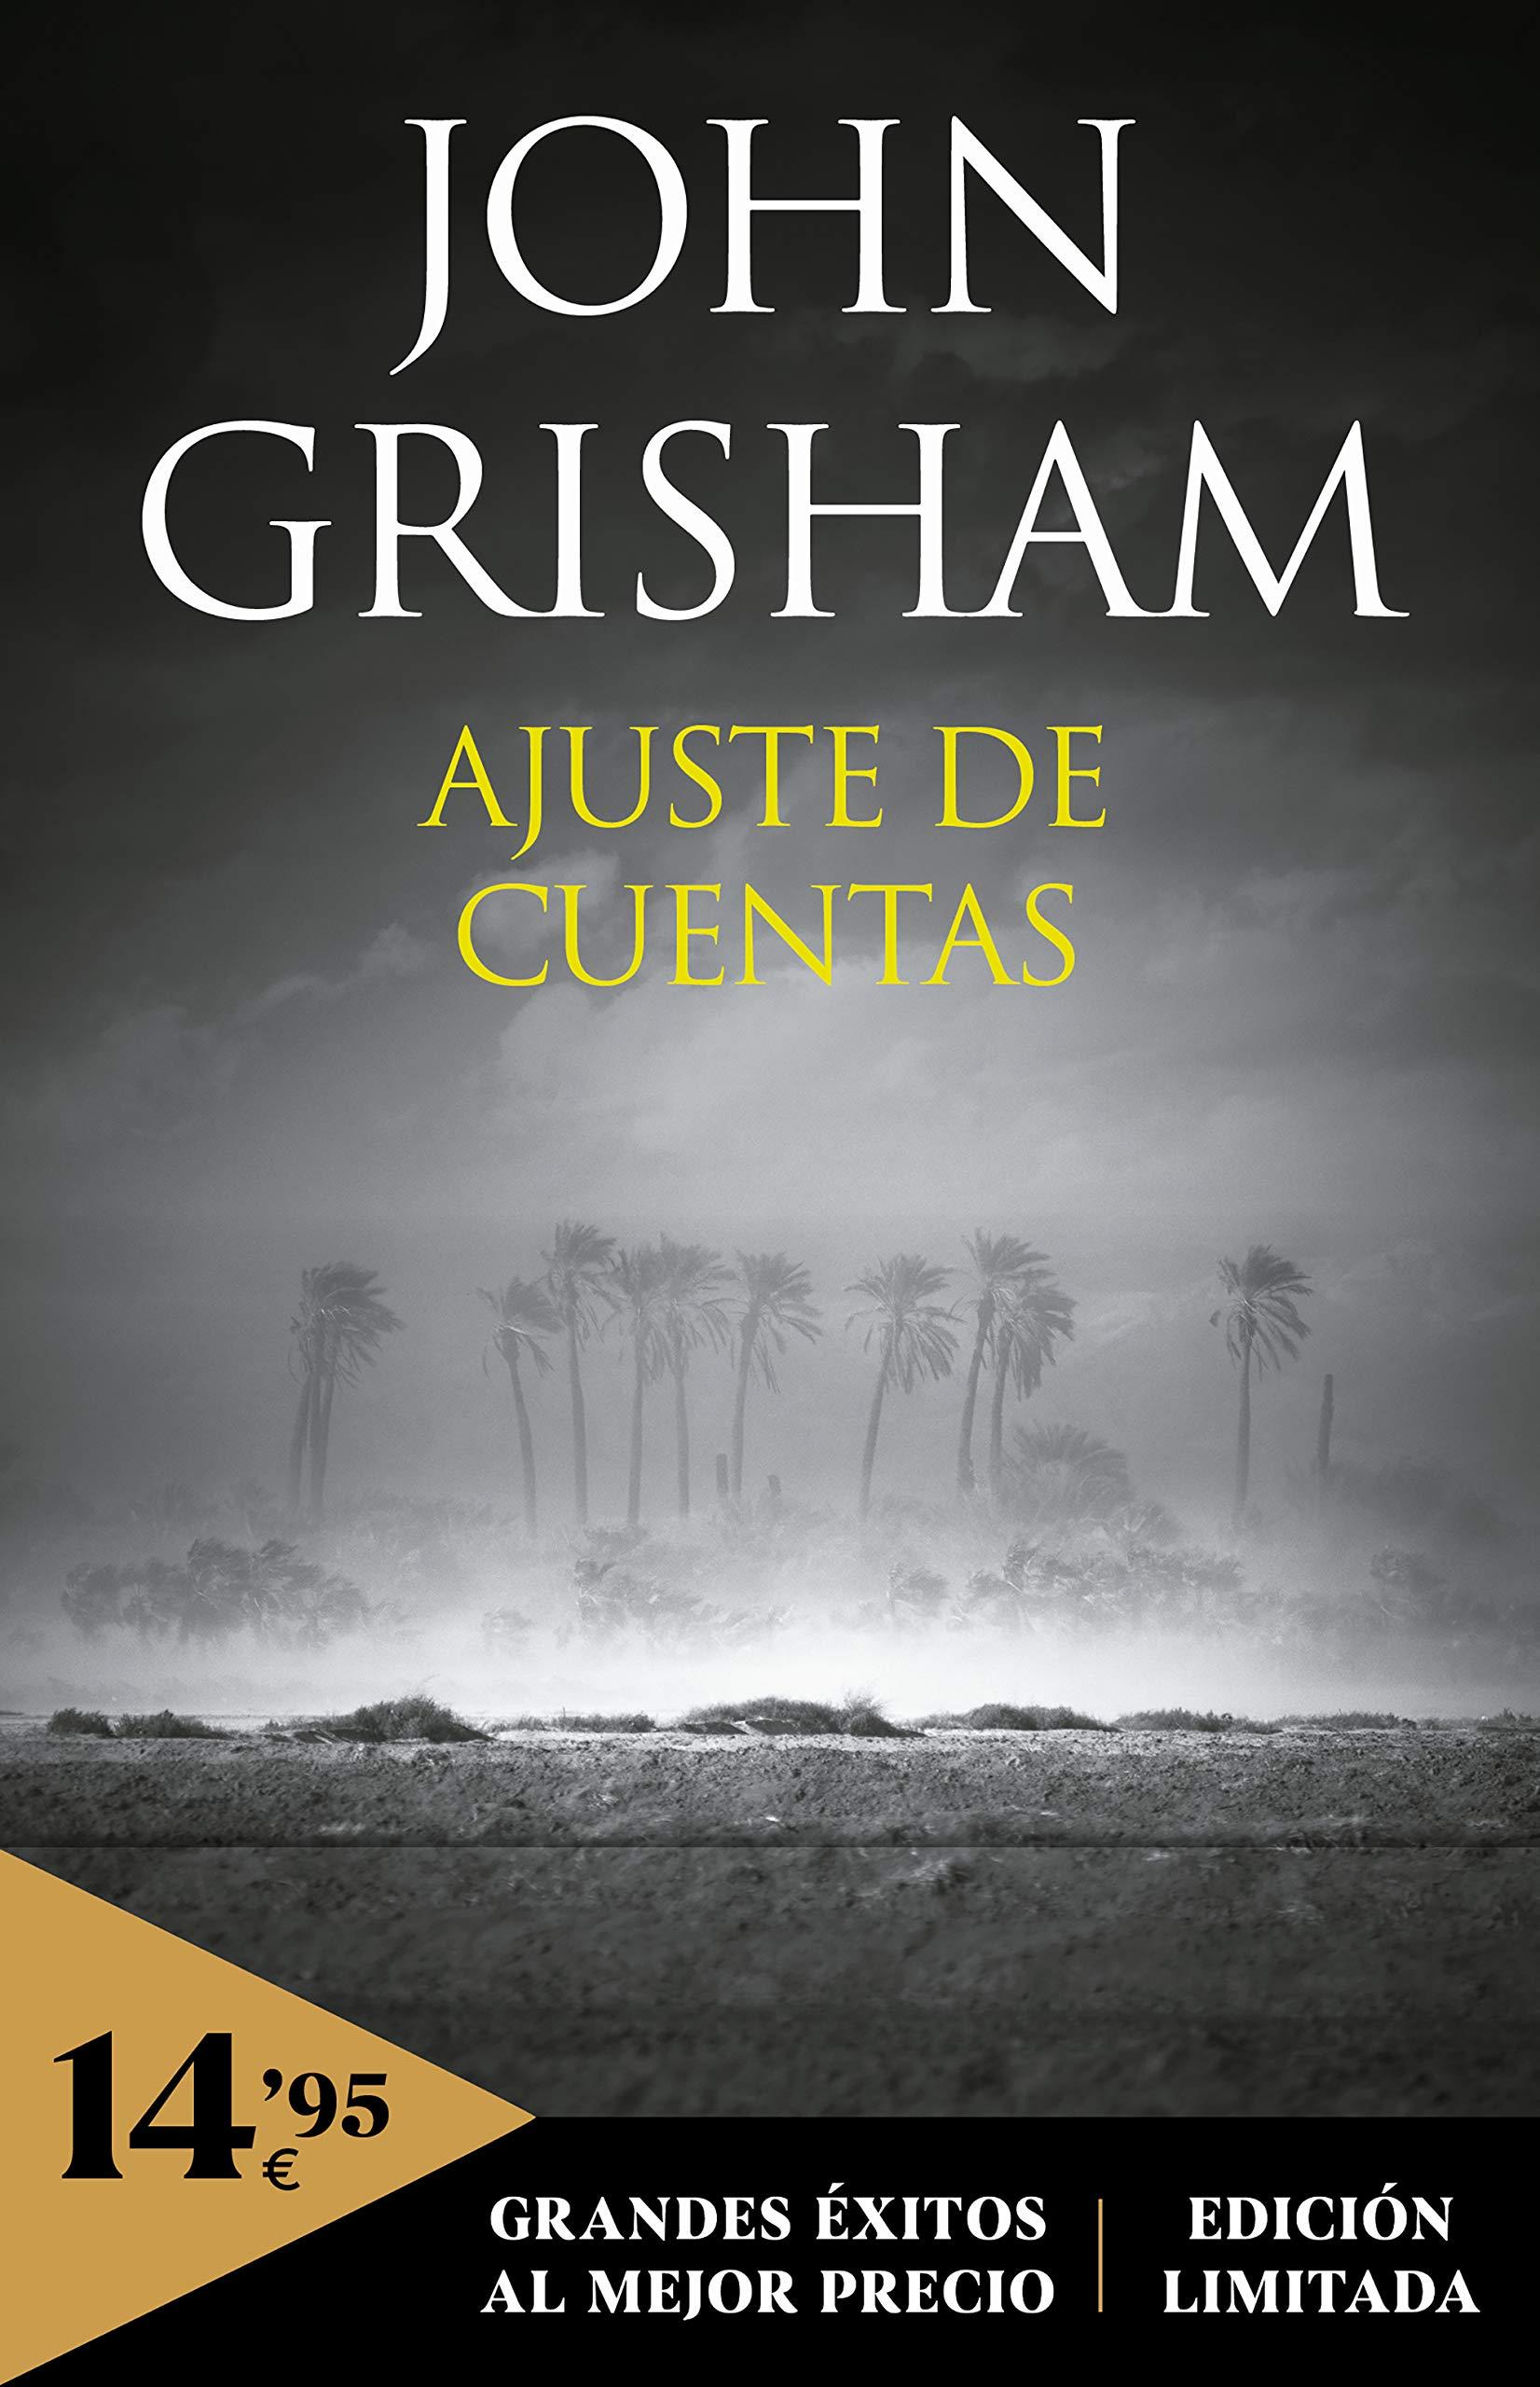 Ajuste De Cuentas Campañas Spanish Edition Grisham John Carlos Abreu Fetter 9788466352048 Books